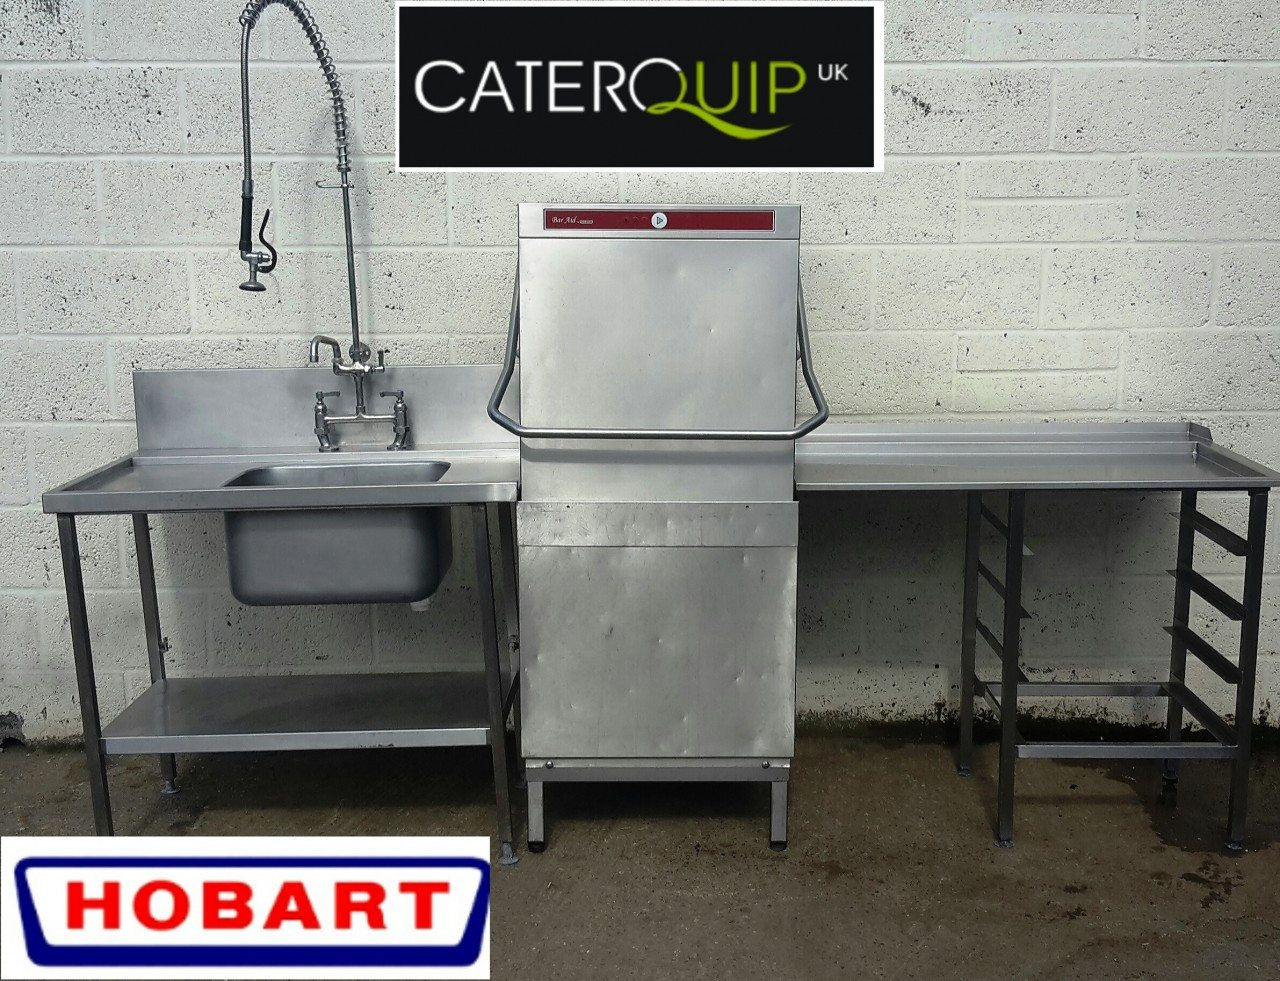 Hobart bar aid pass through hood dish washer with